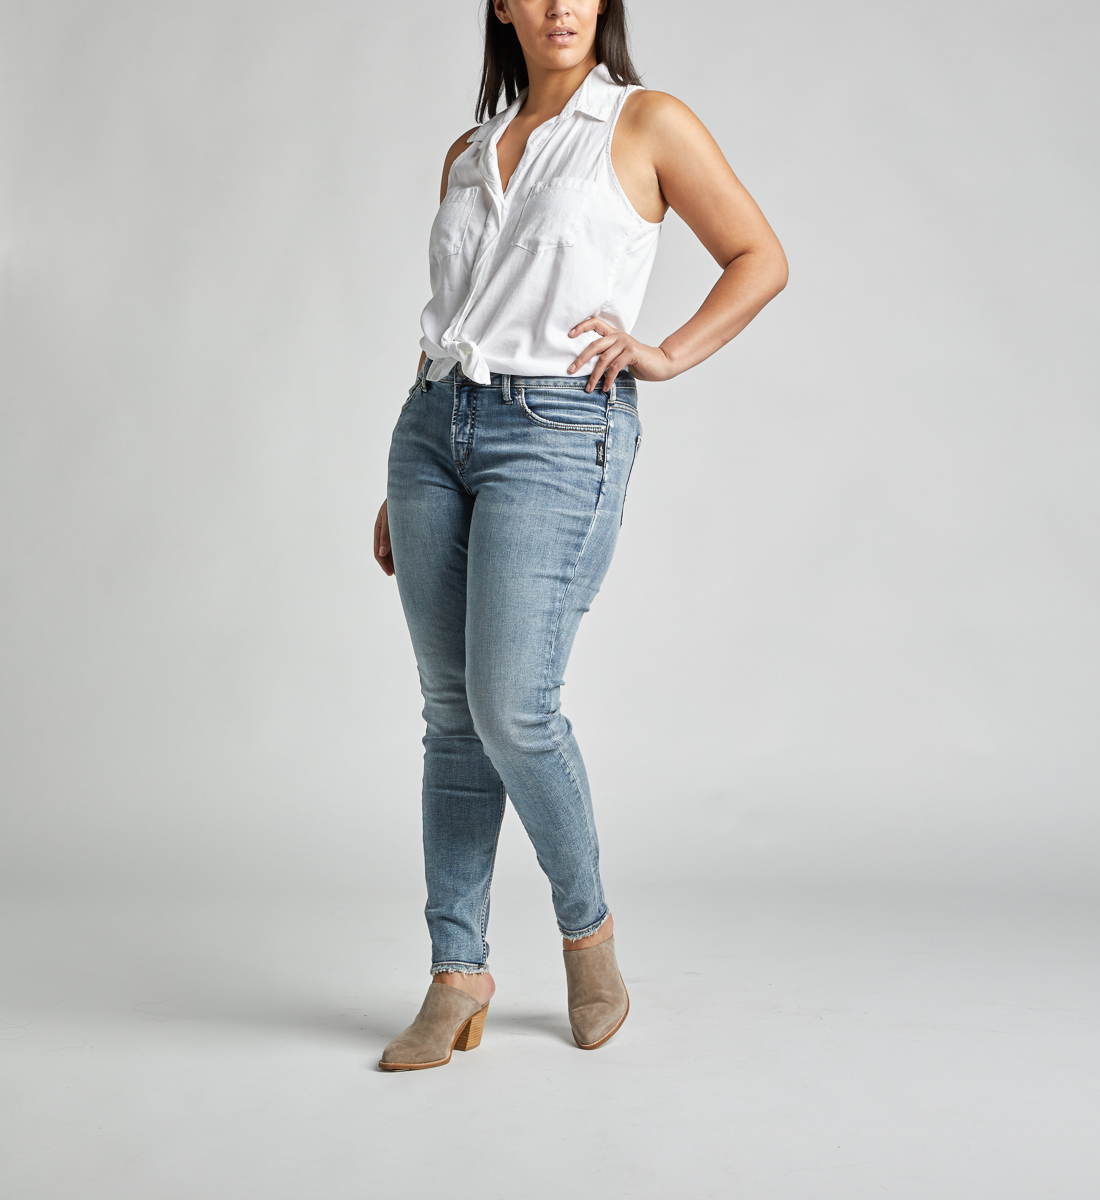 a1321777e30 Avery High Rise Skinny Leg Jeans Plus Size - Silver Jeans CA